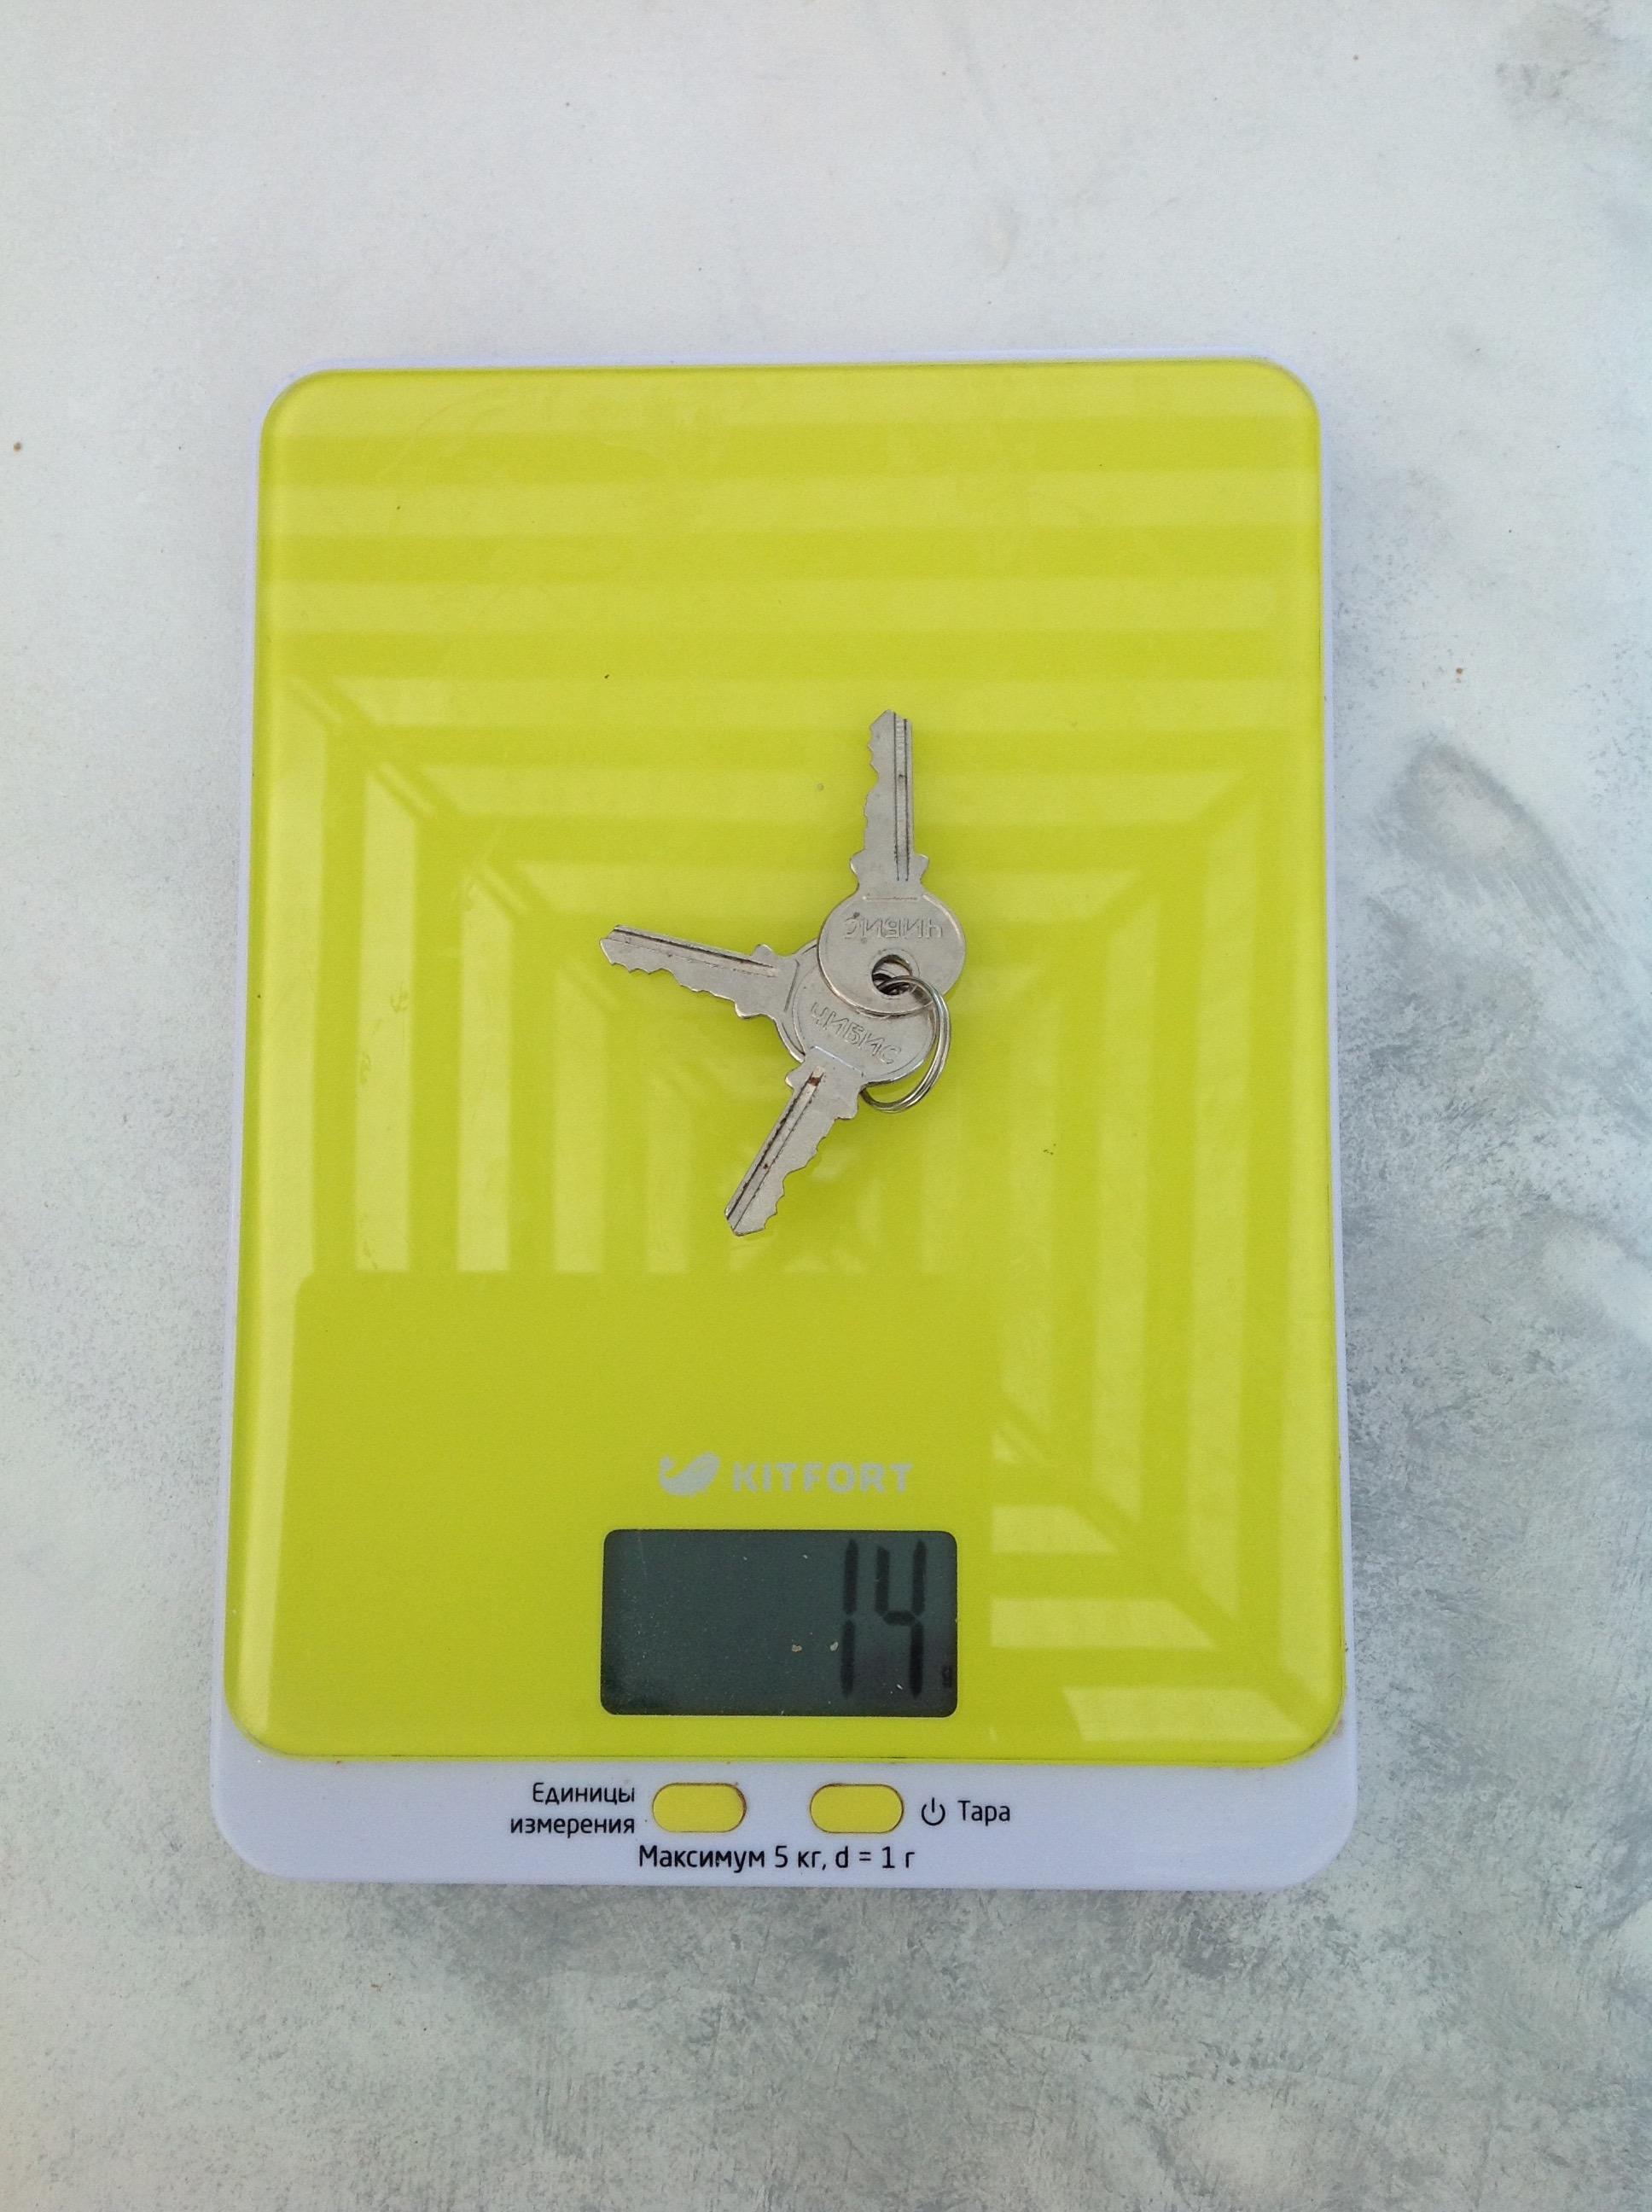 вес связки ключей для малого навесного замка